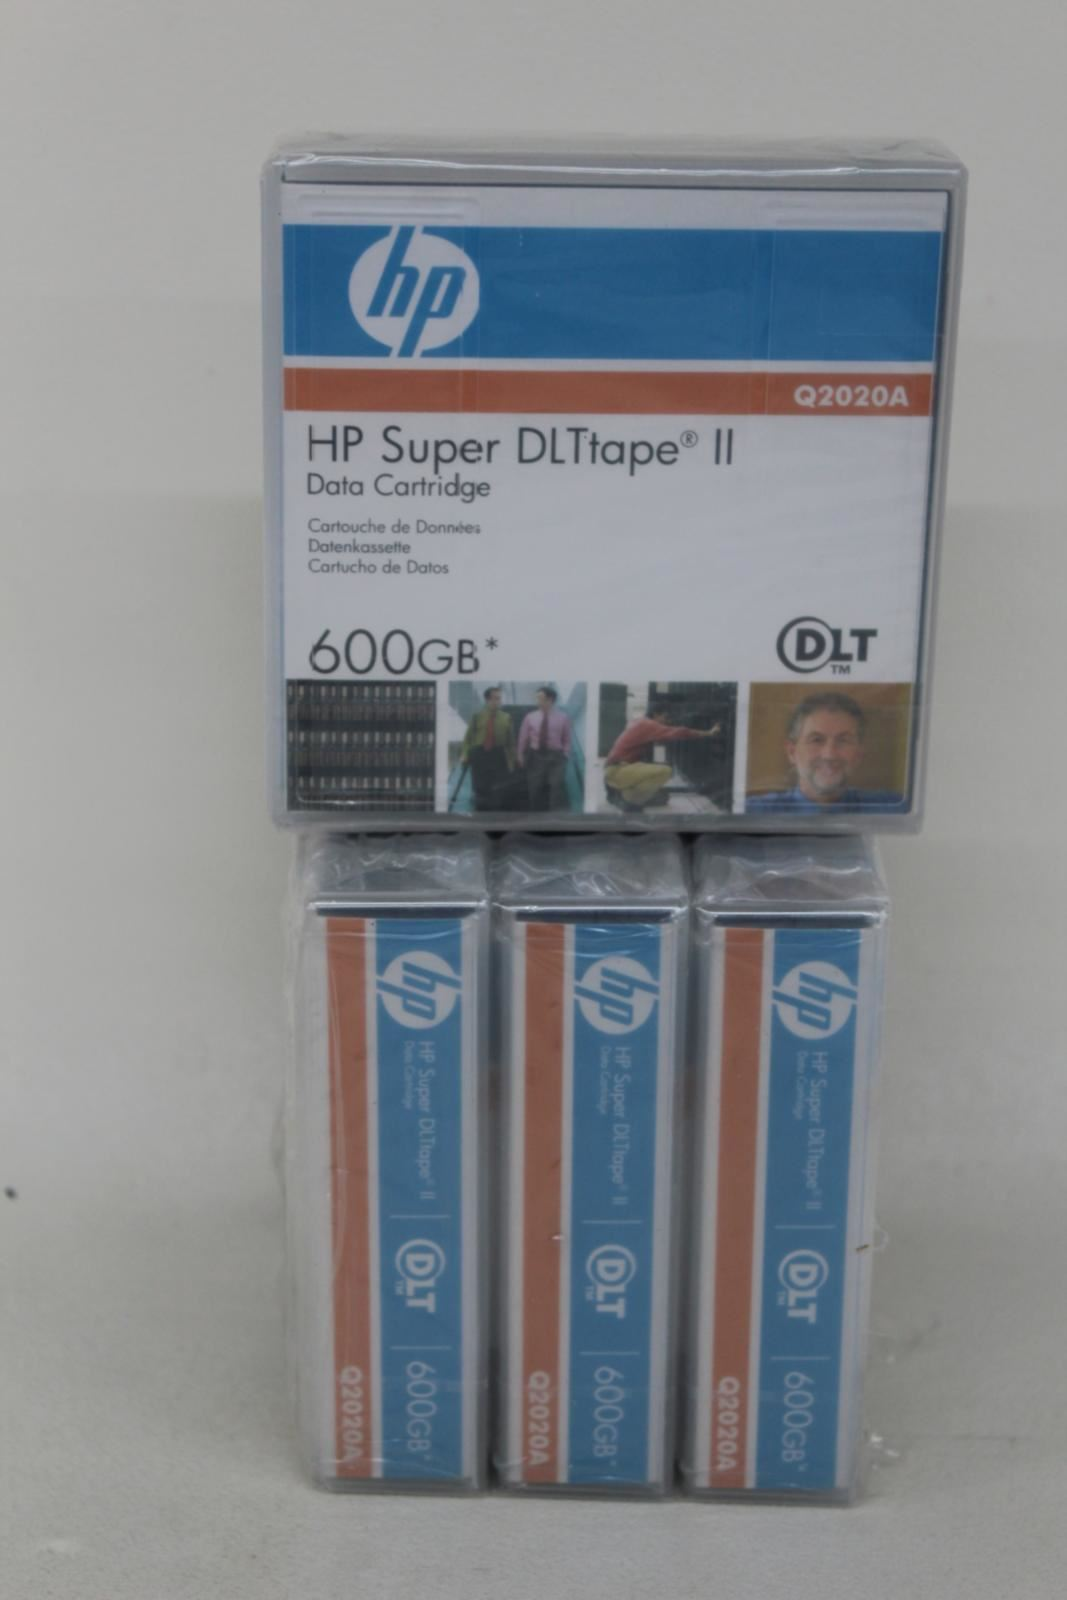 HP-Q2020A-Super-DLtape-II-Data-Tape-Square-cartouche-600-Go-job-lot-4x-NEUF